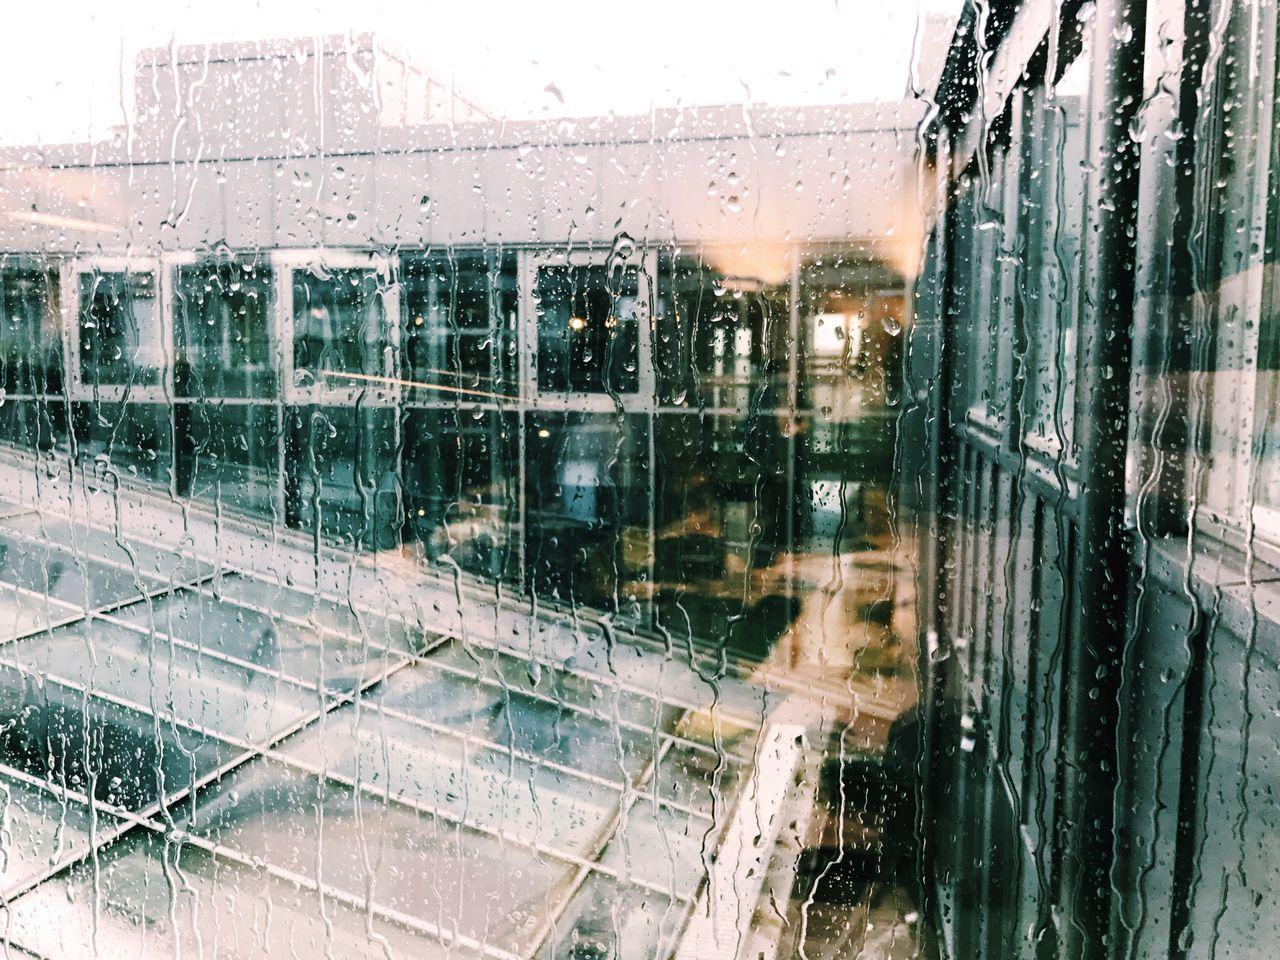 Rain rain rain..... Rain Window Wet Glass - Material Drop Transparent Water Rainy Season RainDrop Weather Indoors  Torrential Rain Looking Through Window Reflection Condensation No People Day Shower Close-up Nature Rainy Days Indoor Weather Weather Photography